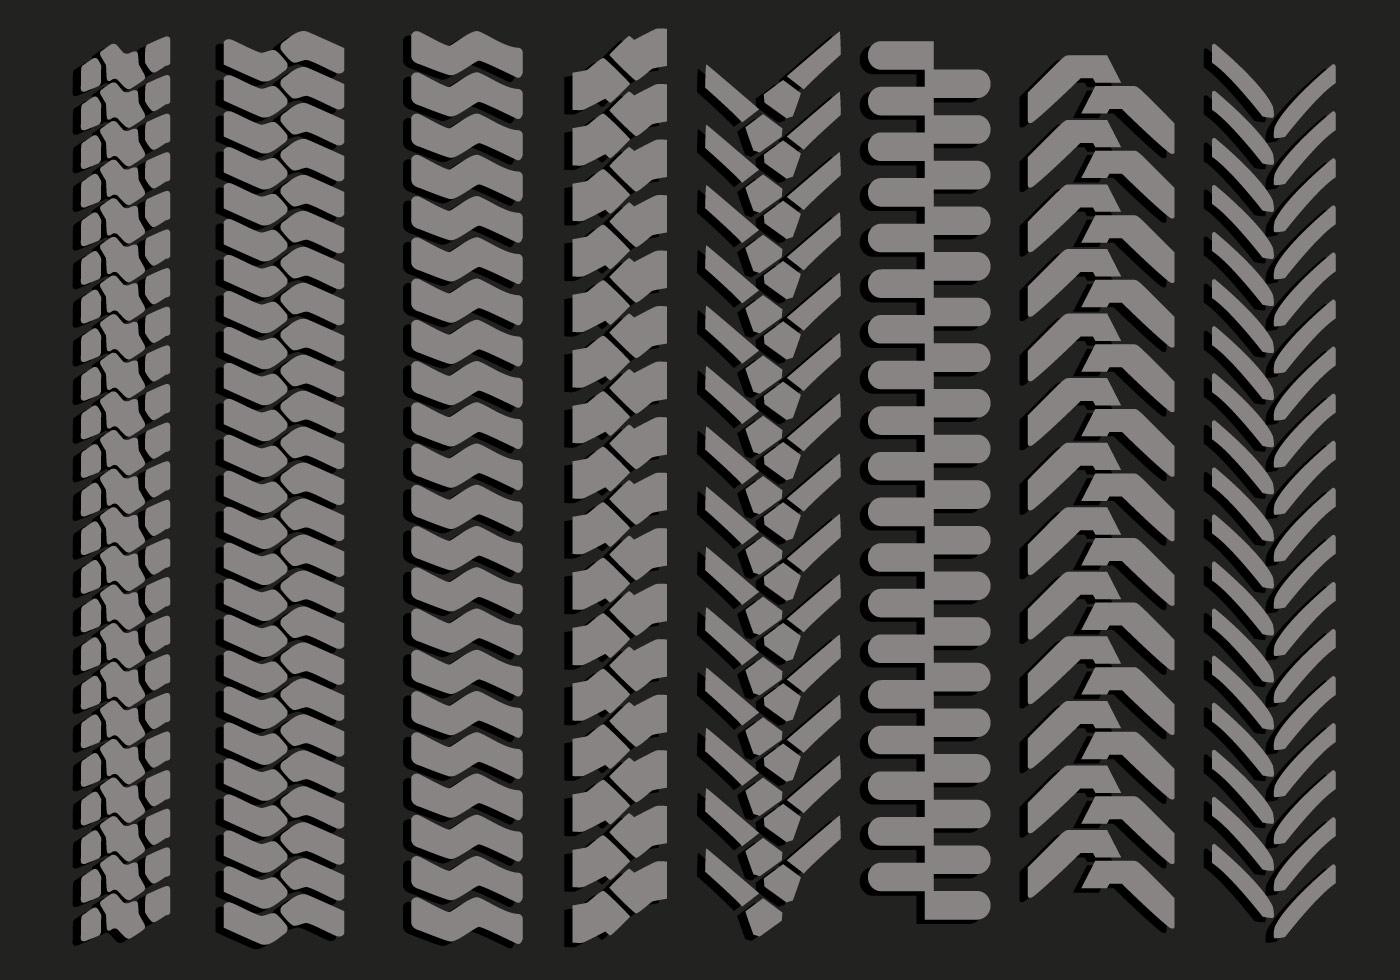 tire marks vectors download free vector art stock